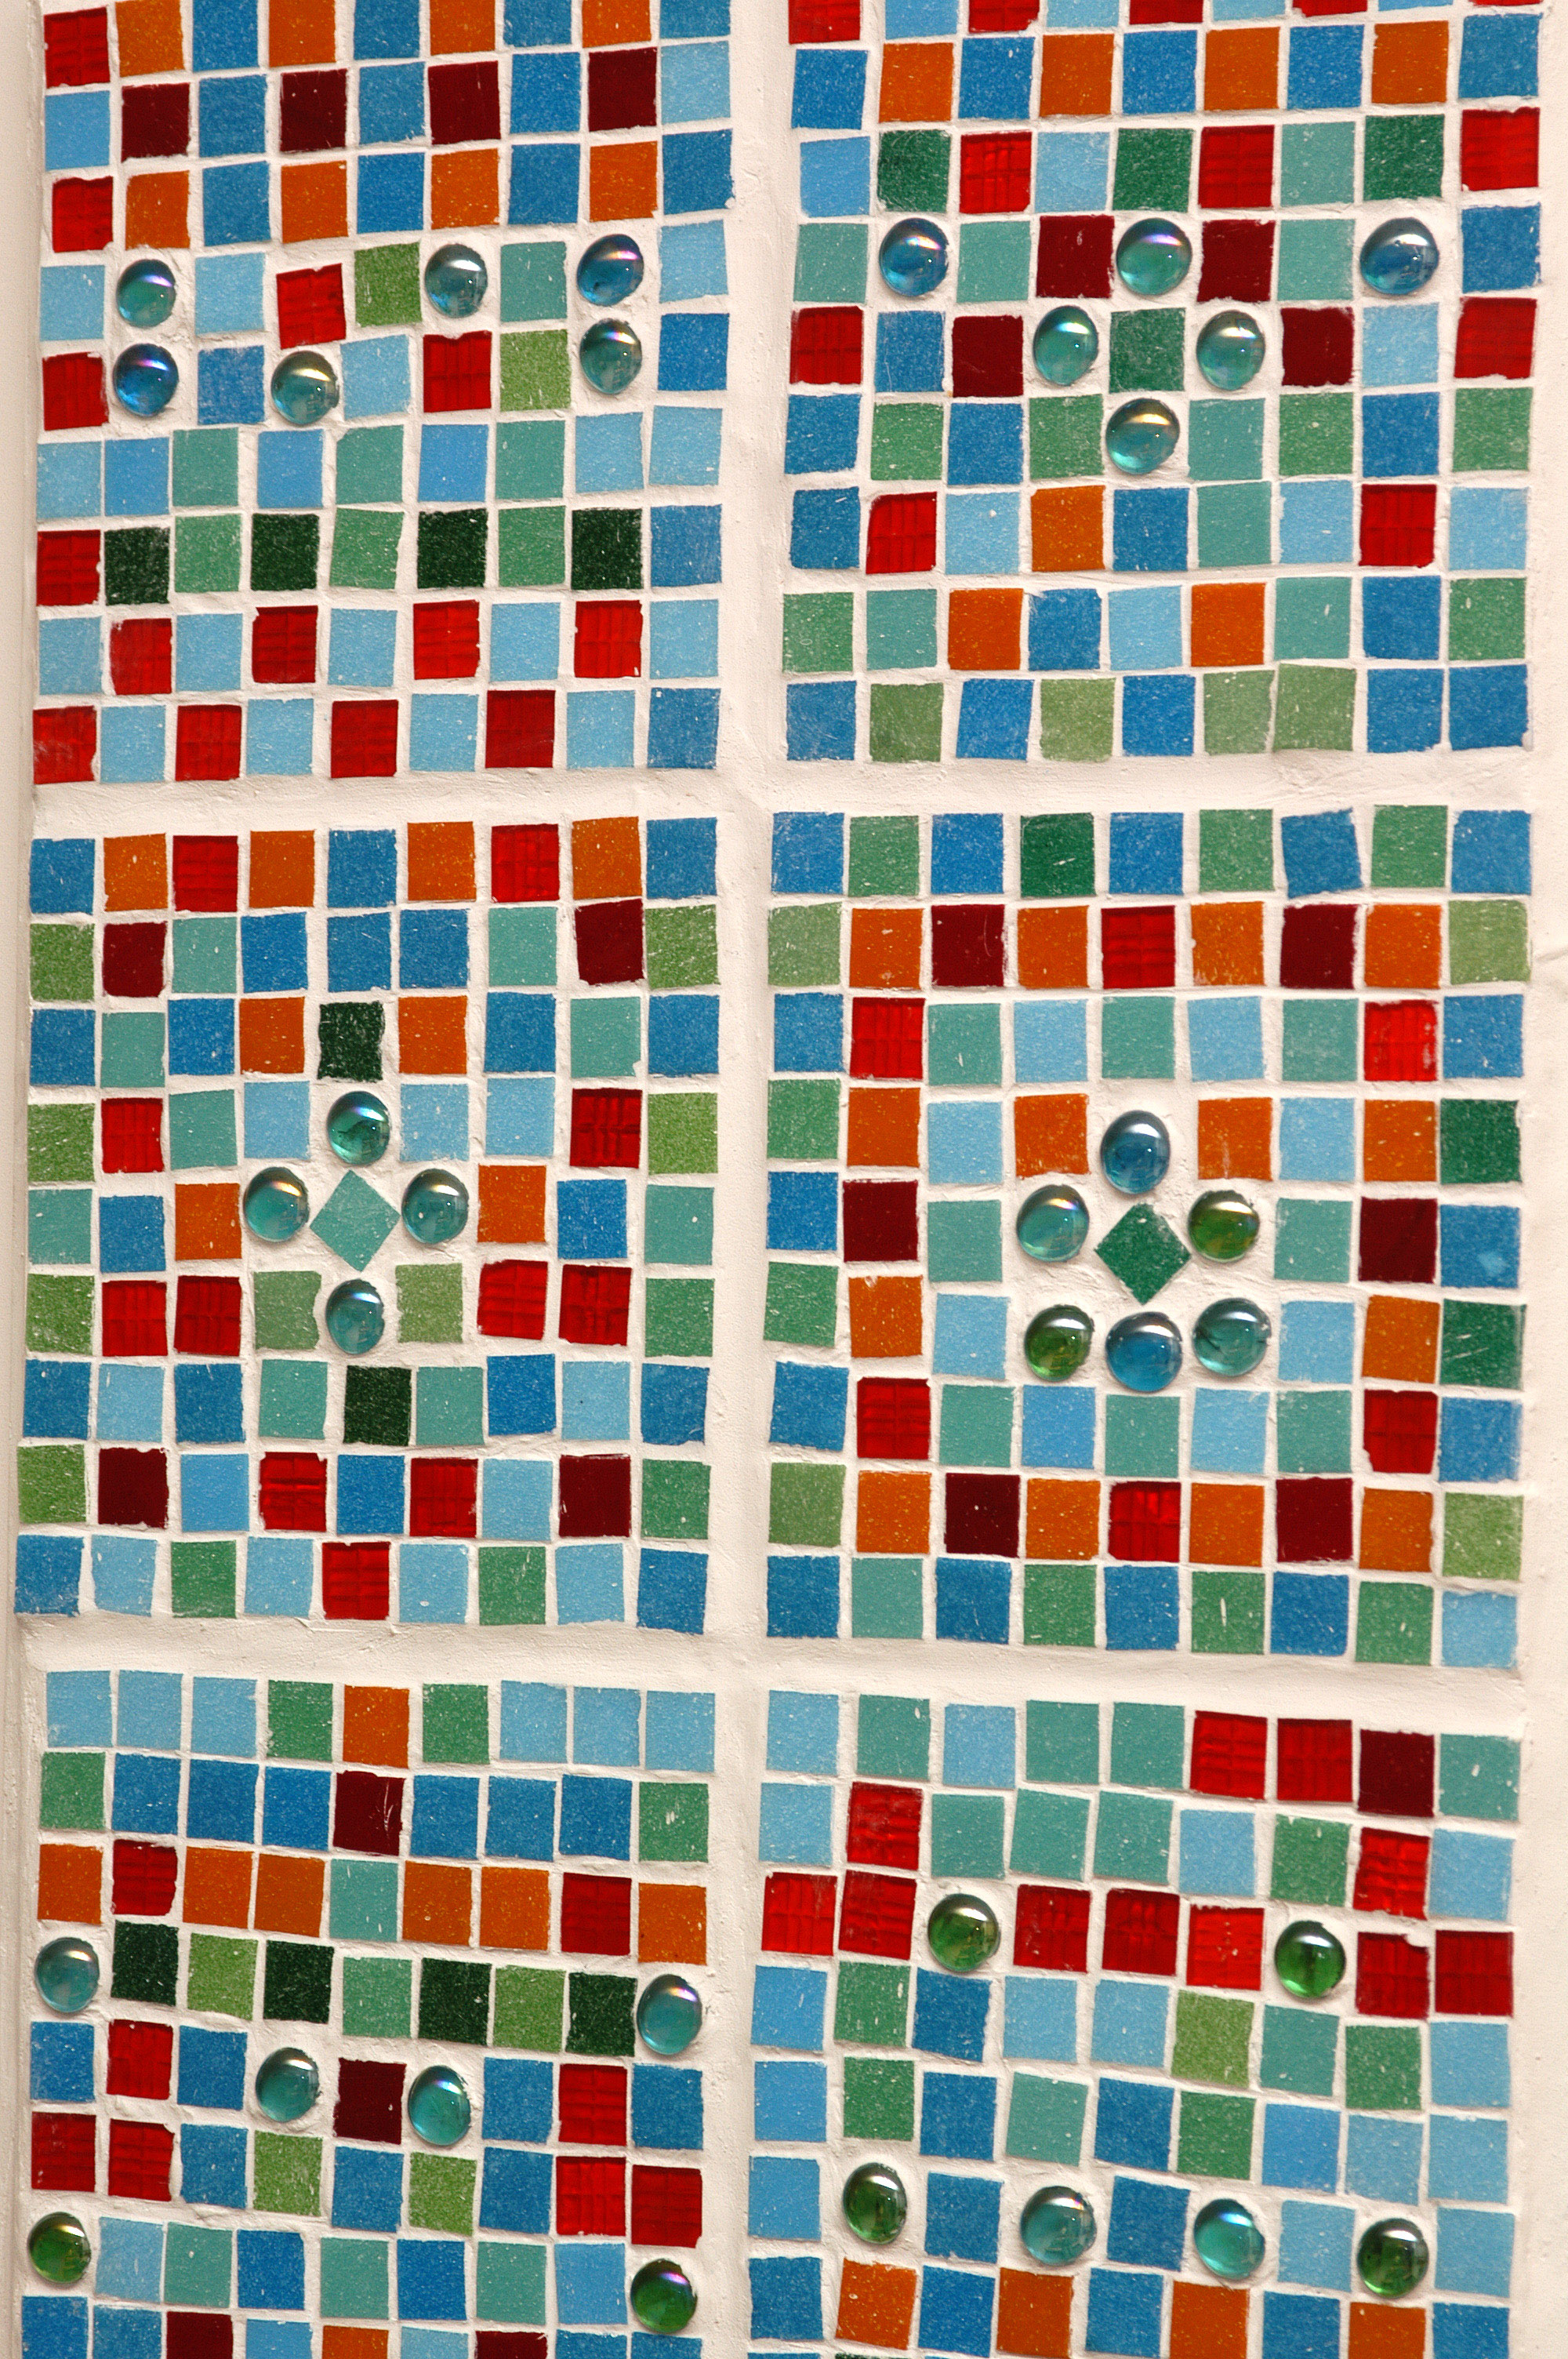 One panel of 6 mosaic works for orthopaedics